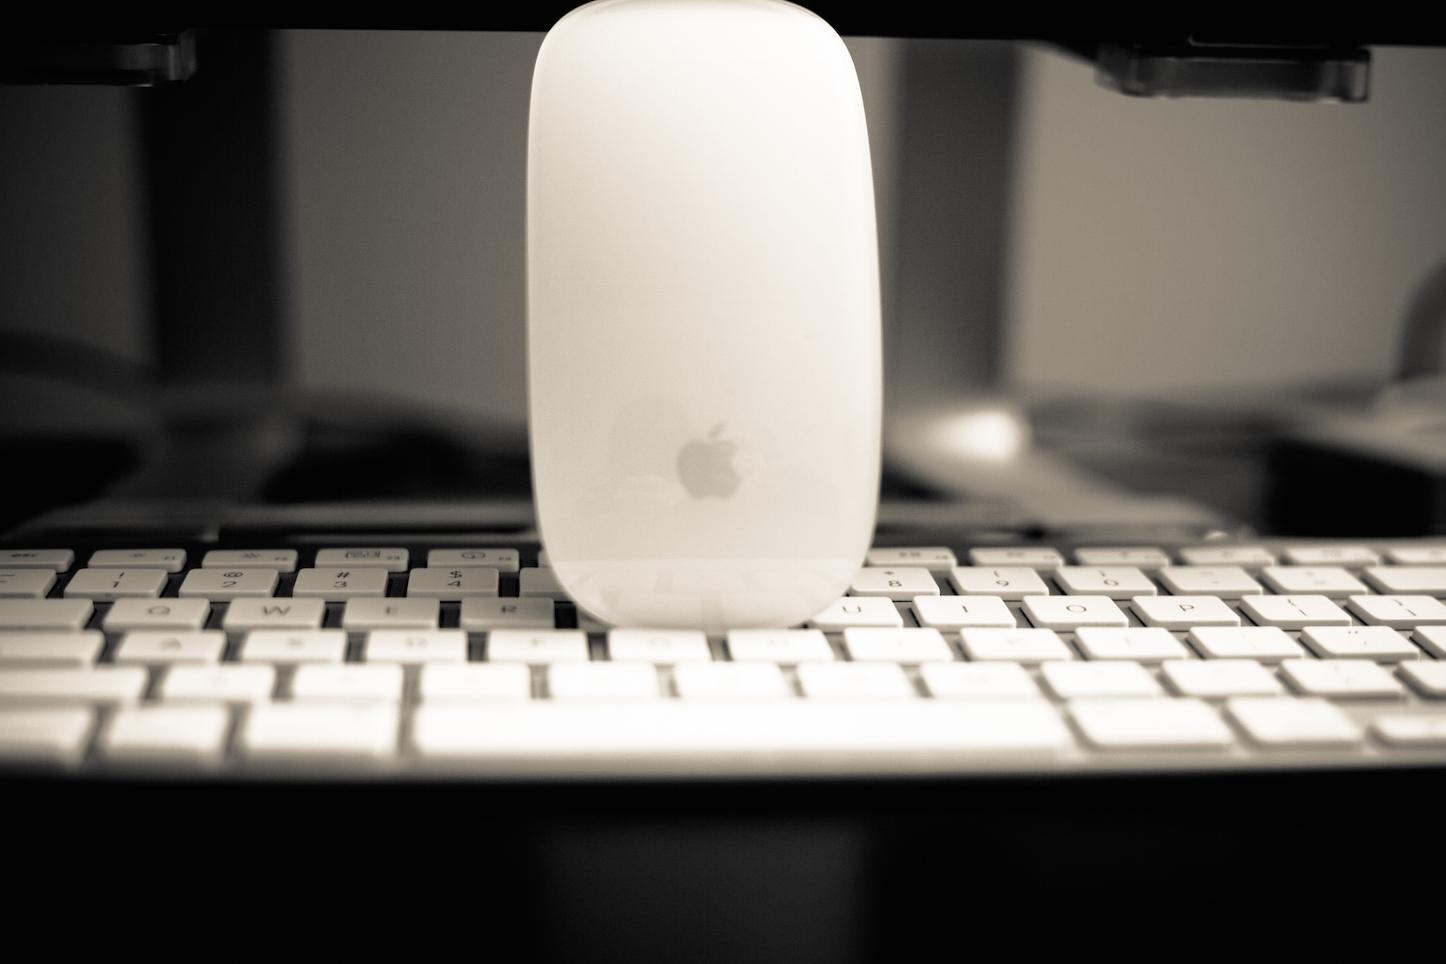 Magic mouse wireless keyboard